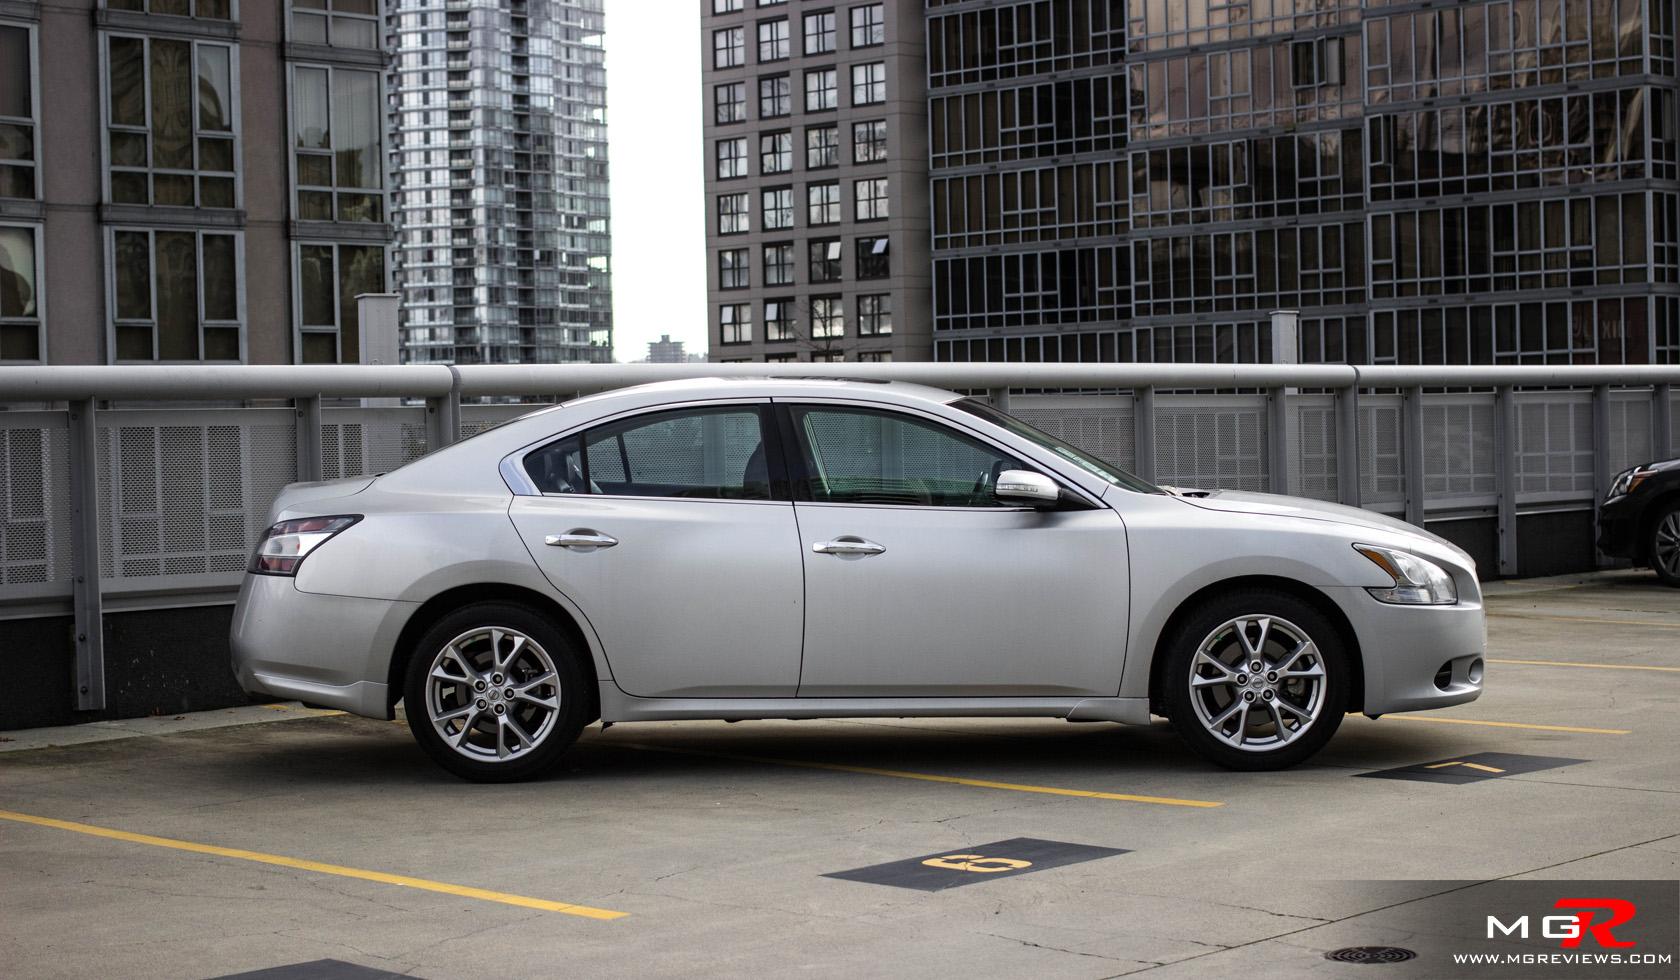 Review: 2013 Nissan Maxima – M.G.Reviews